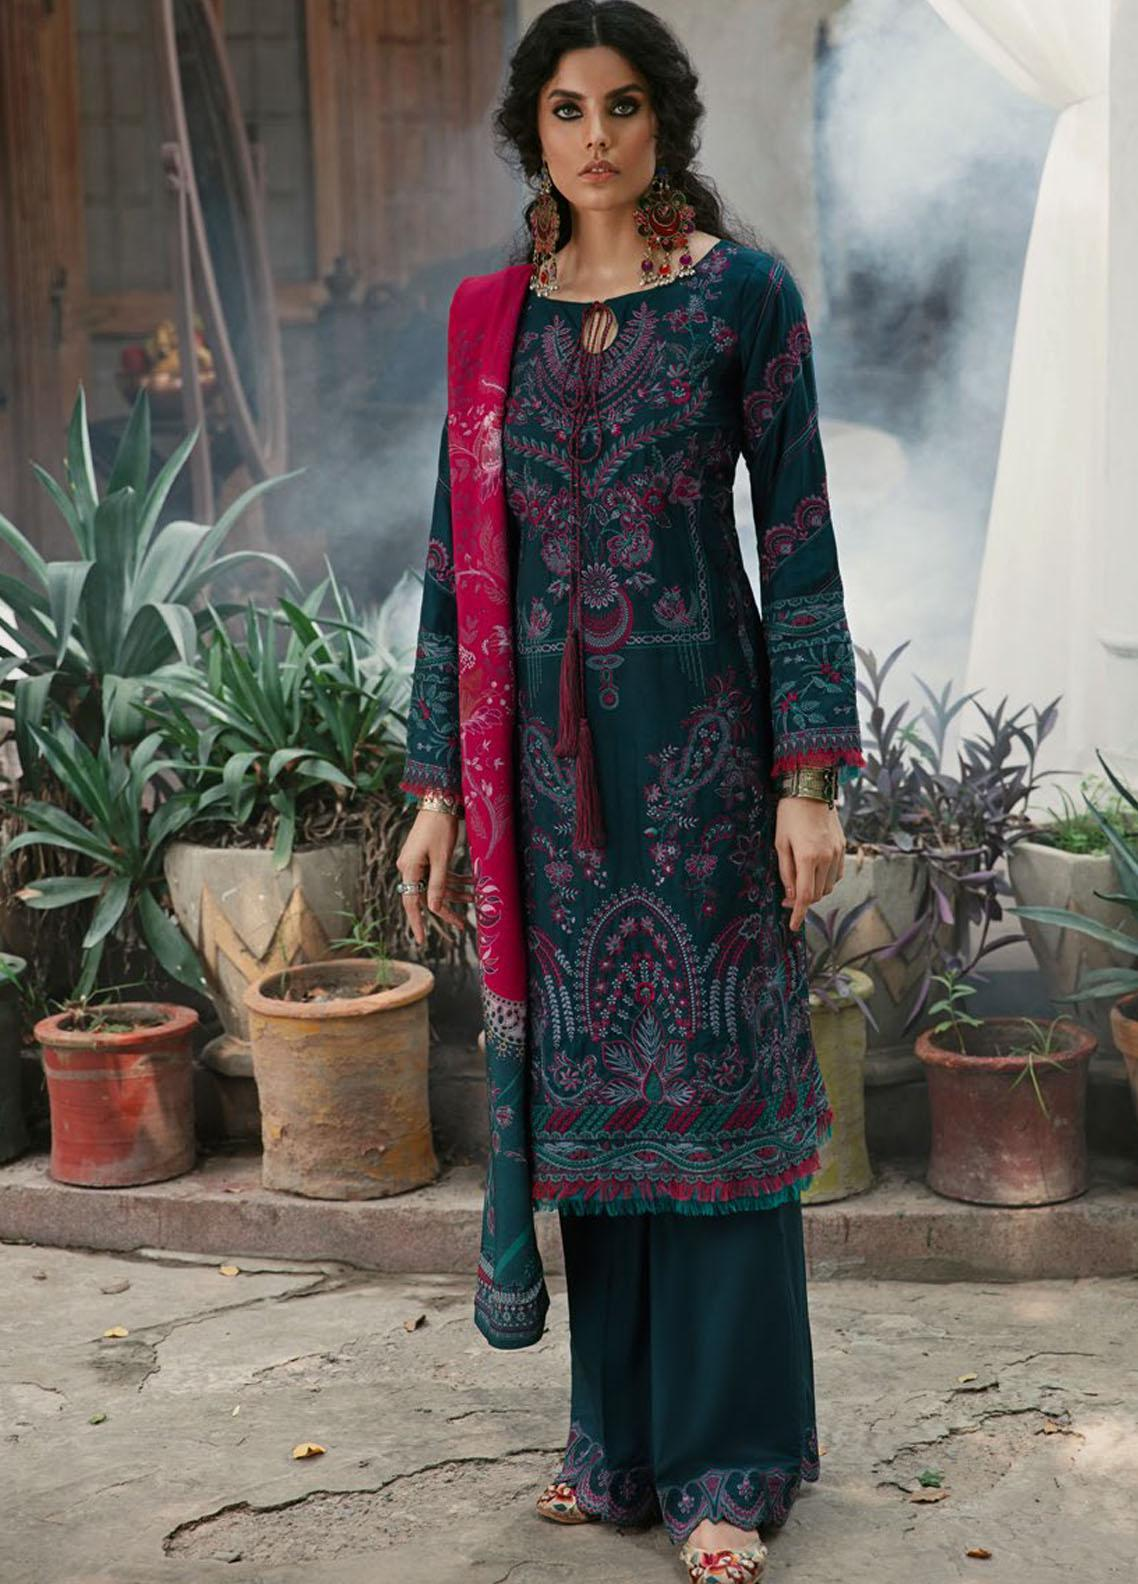 Wasiyat by Motifz Embroidered Cotton Satin Suits Unstitched 3 Piece MT21W MWUA-3025 MAHGOL-A - Winter Collection